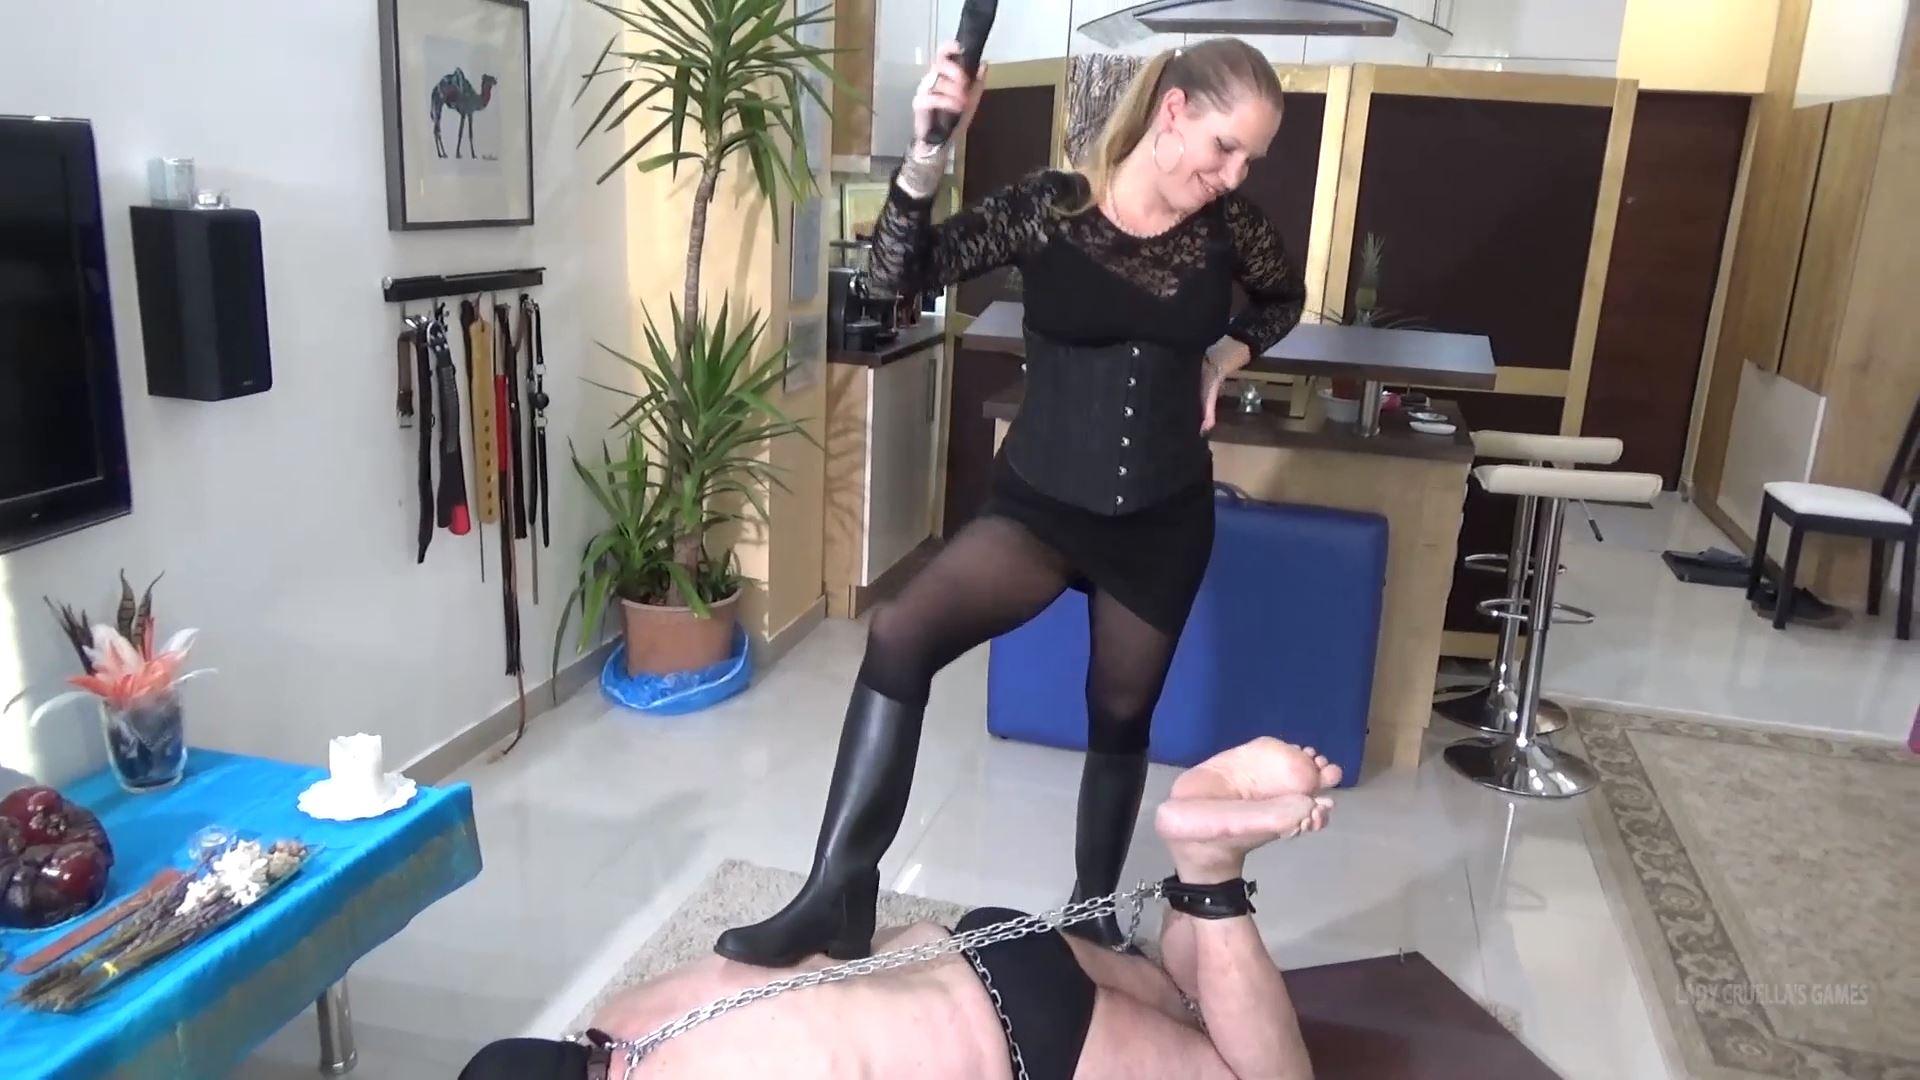 Lady Cruella In Scene: DOMESTIC HUSBAND - CRUEL FOOT SPANKING - LADY CRUELLAS GAMES - FULL HD/1080p/MP4